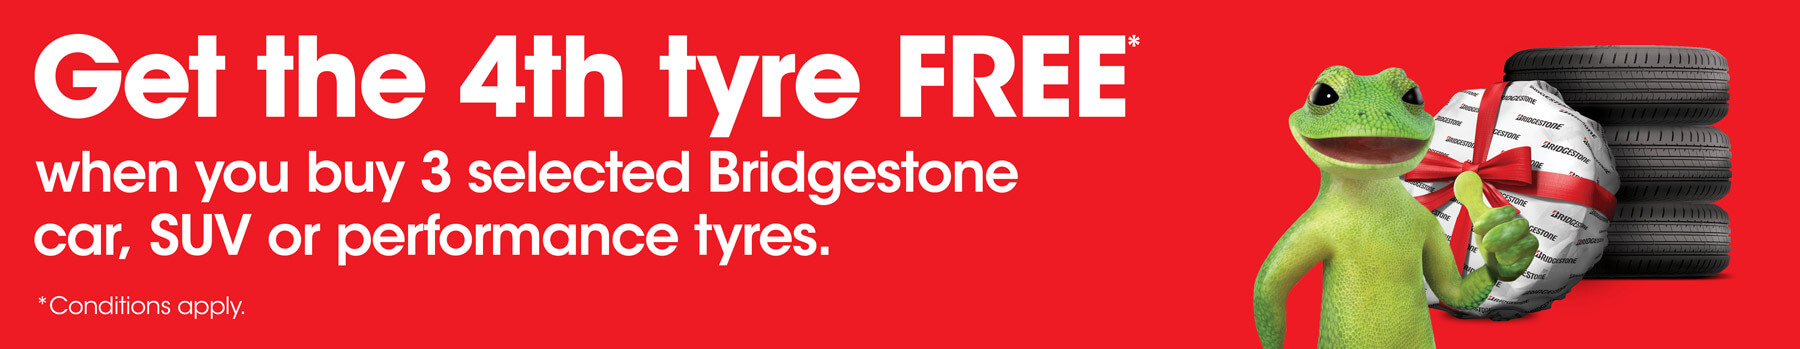 Bridgestone 4th Tyre Free